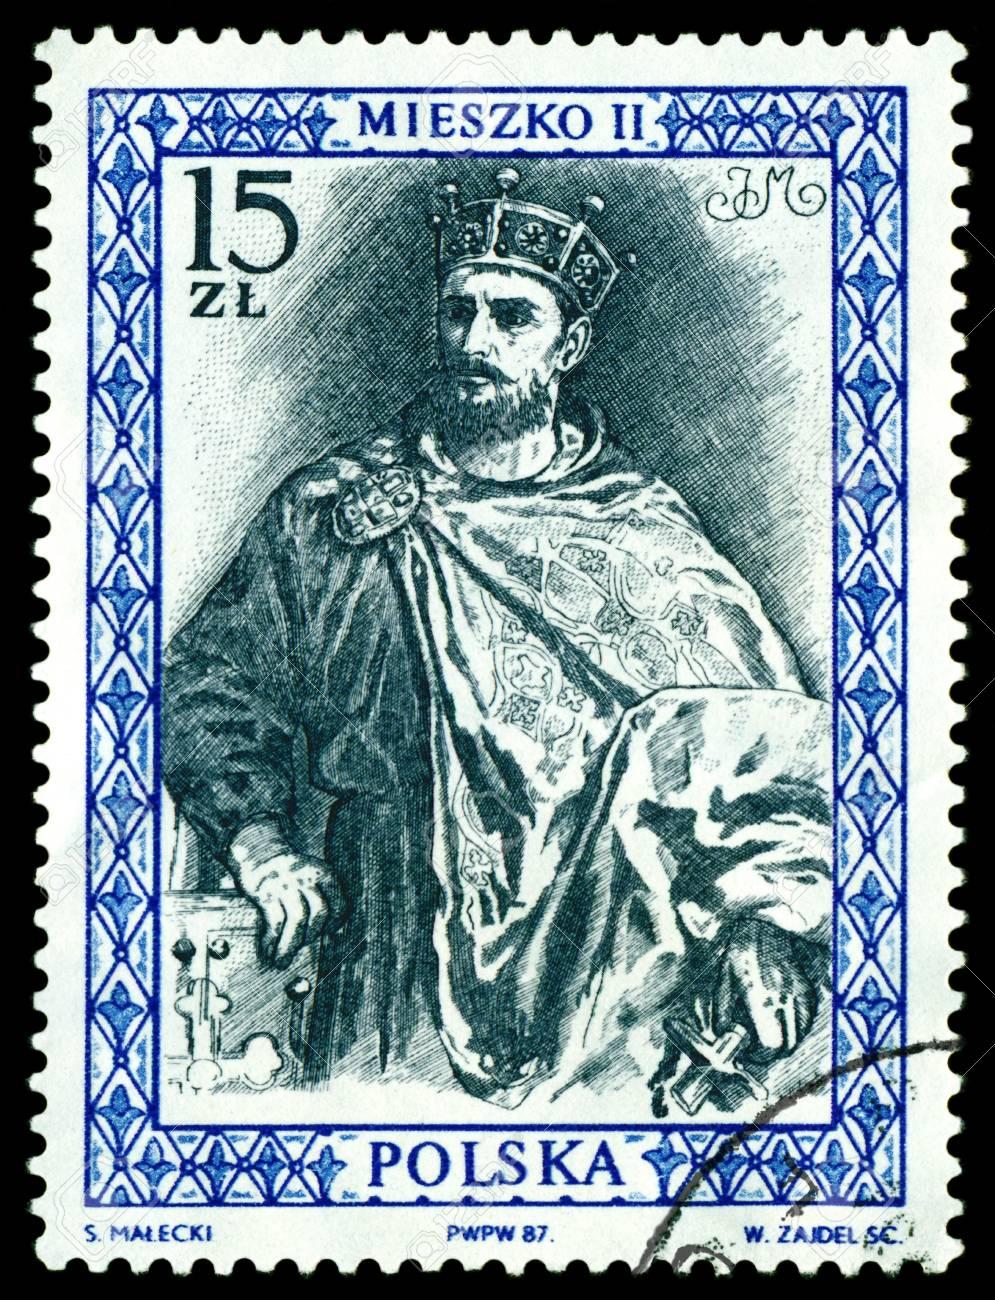 POLAND  - CIRCA 1987  a stamp printed by Poland shows portrait King Mieszko II  King of the Poland  990 - 1034 , circa 1987 Stock Photo - 14890056